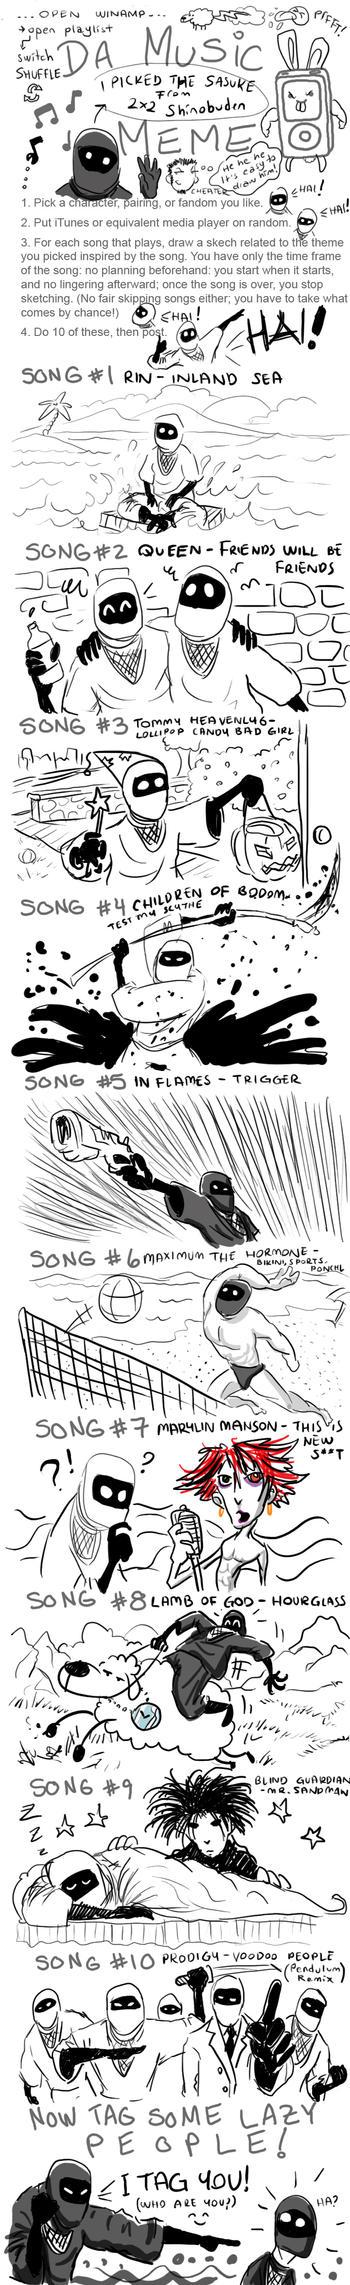 melihyilmaz's Music Meme by melihyilmaz